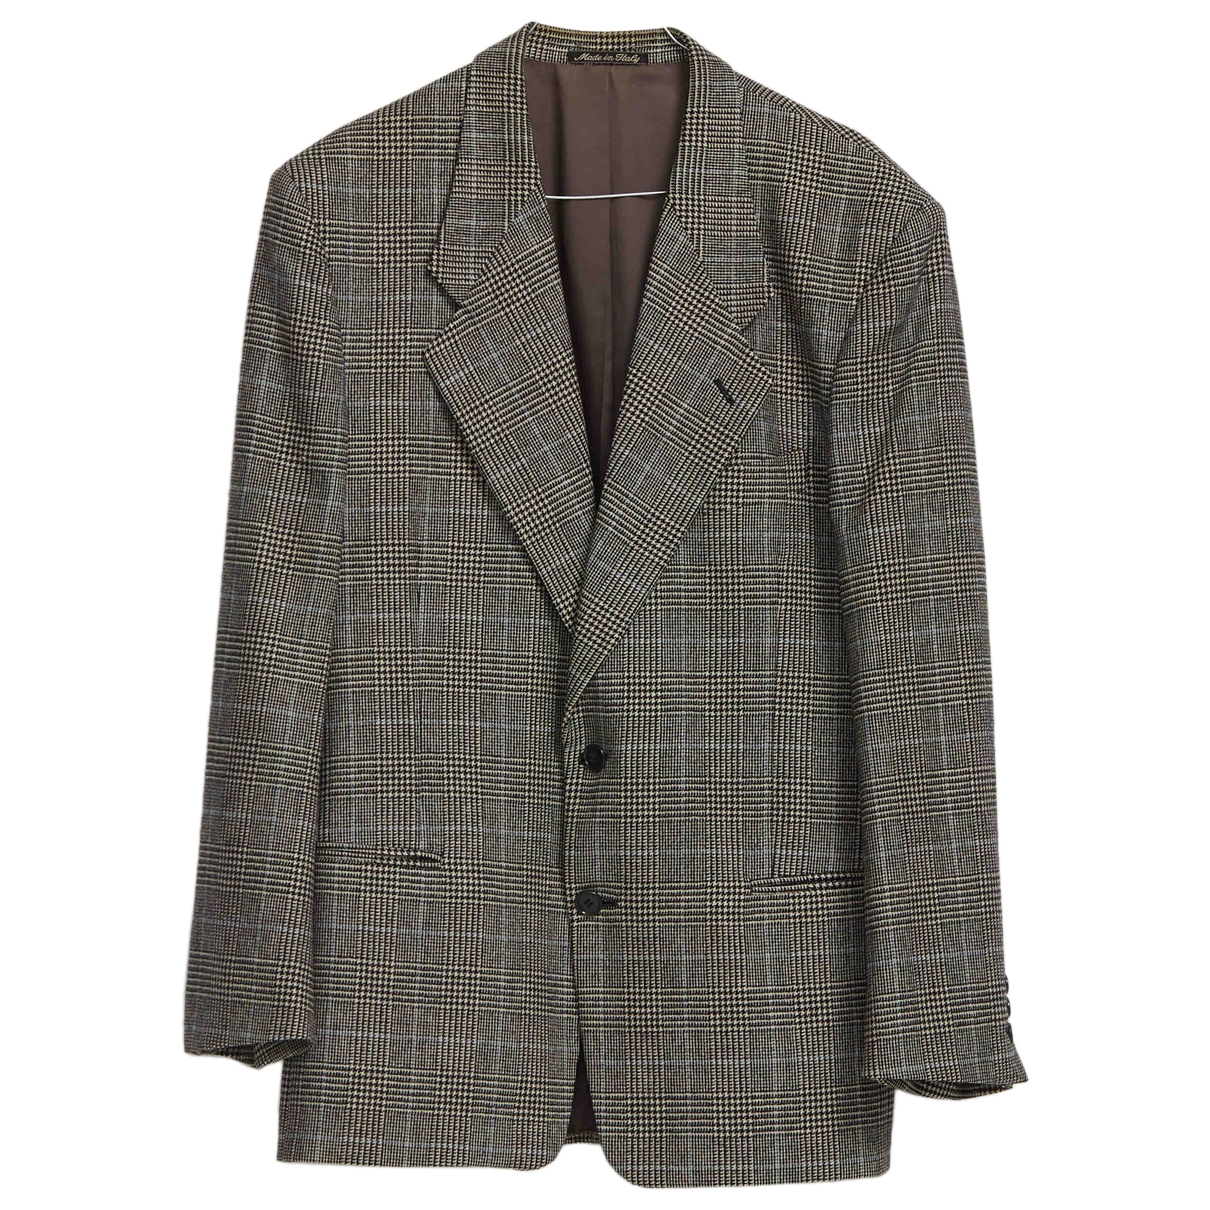 Armani Collezioni \N Multicolour Wool jacket  for Men 44 IT